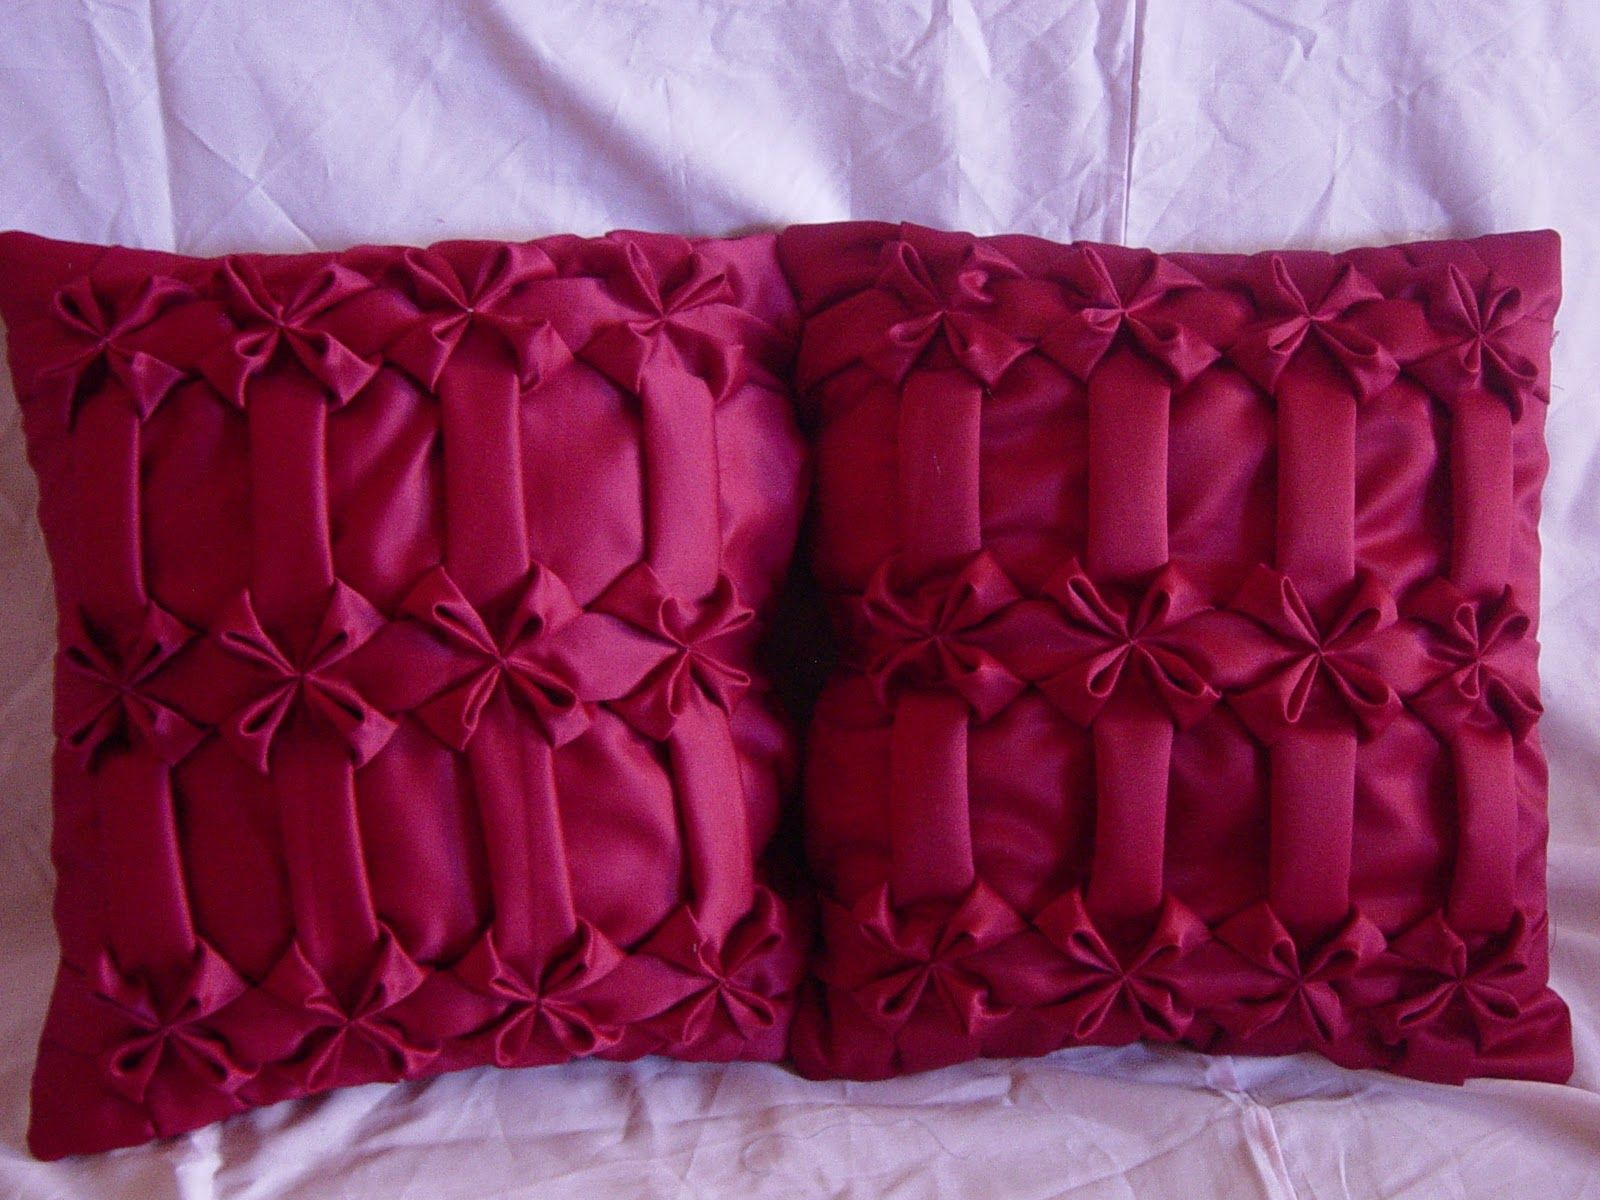 Cojines Drapeados Comprar.Cojines Drapeados Draped Cushions Google Search